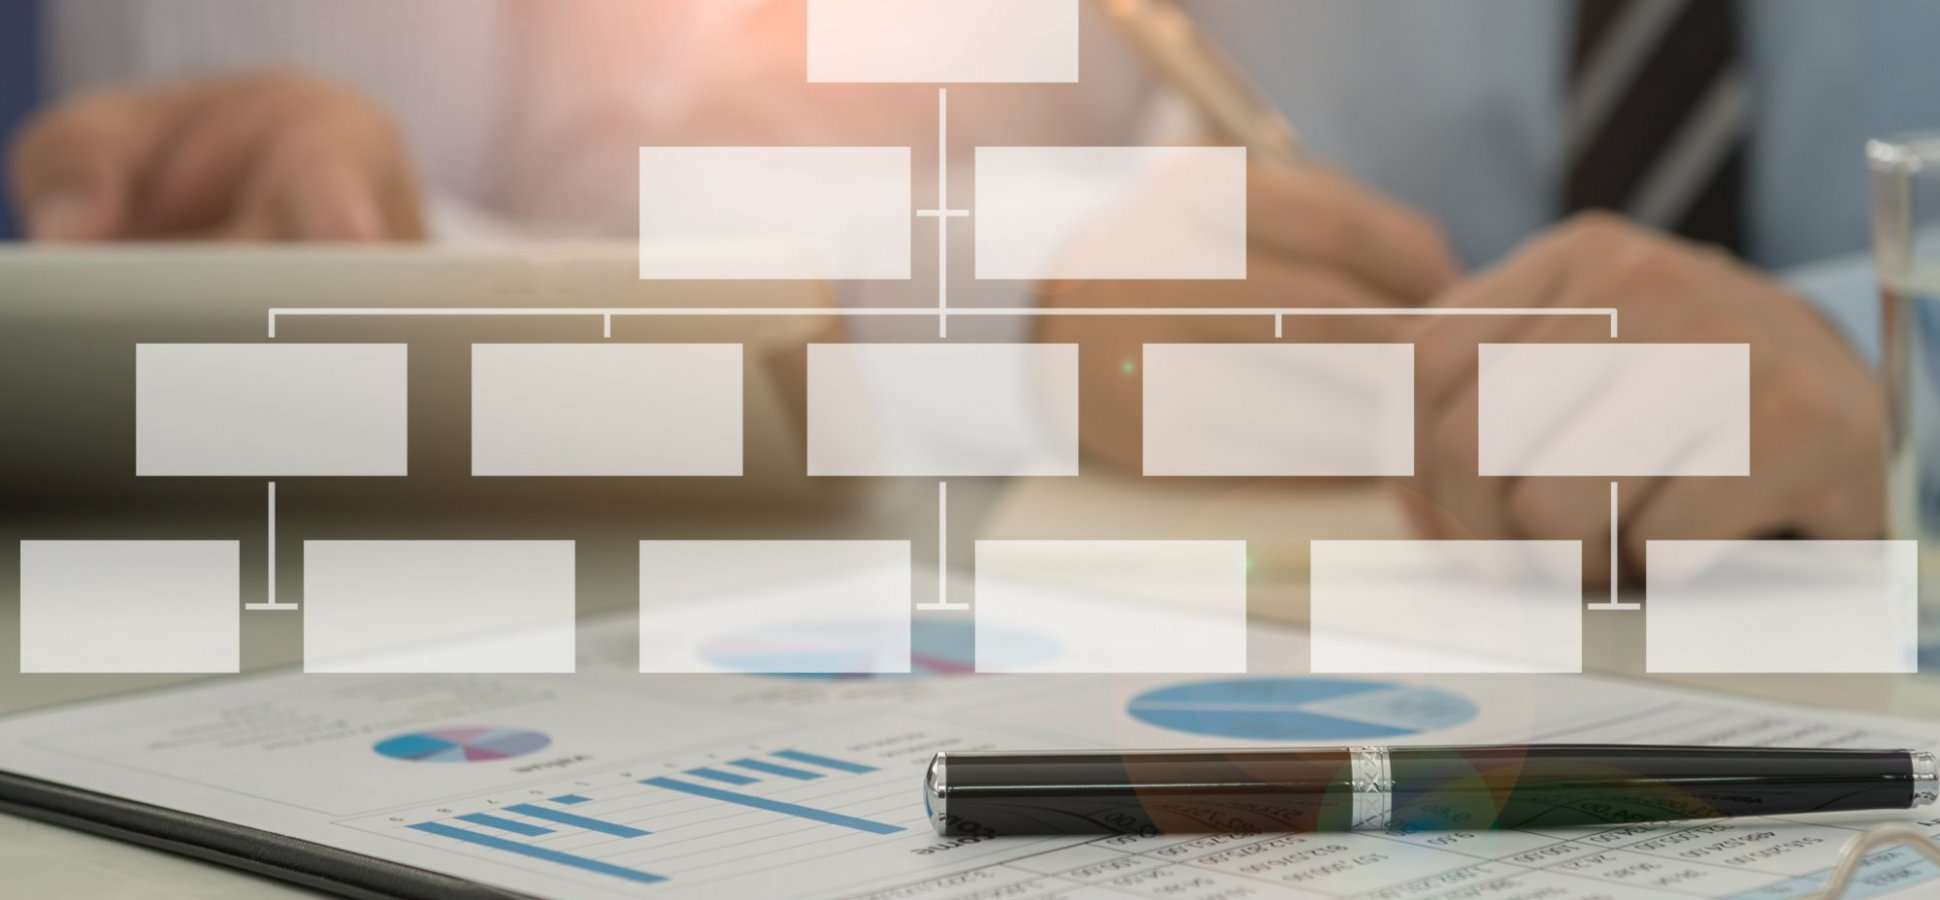 inc.com - Soren Kaplan - Is Organizational Structure The Secret to Innovation?